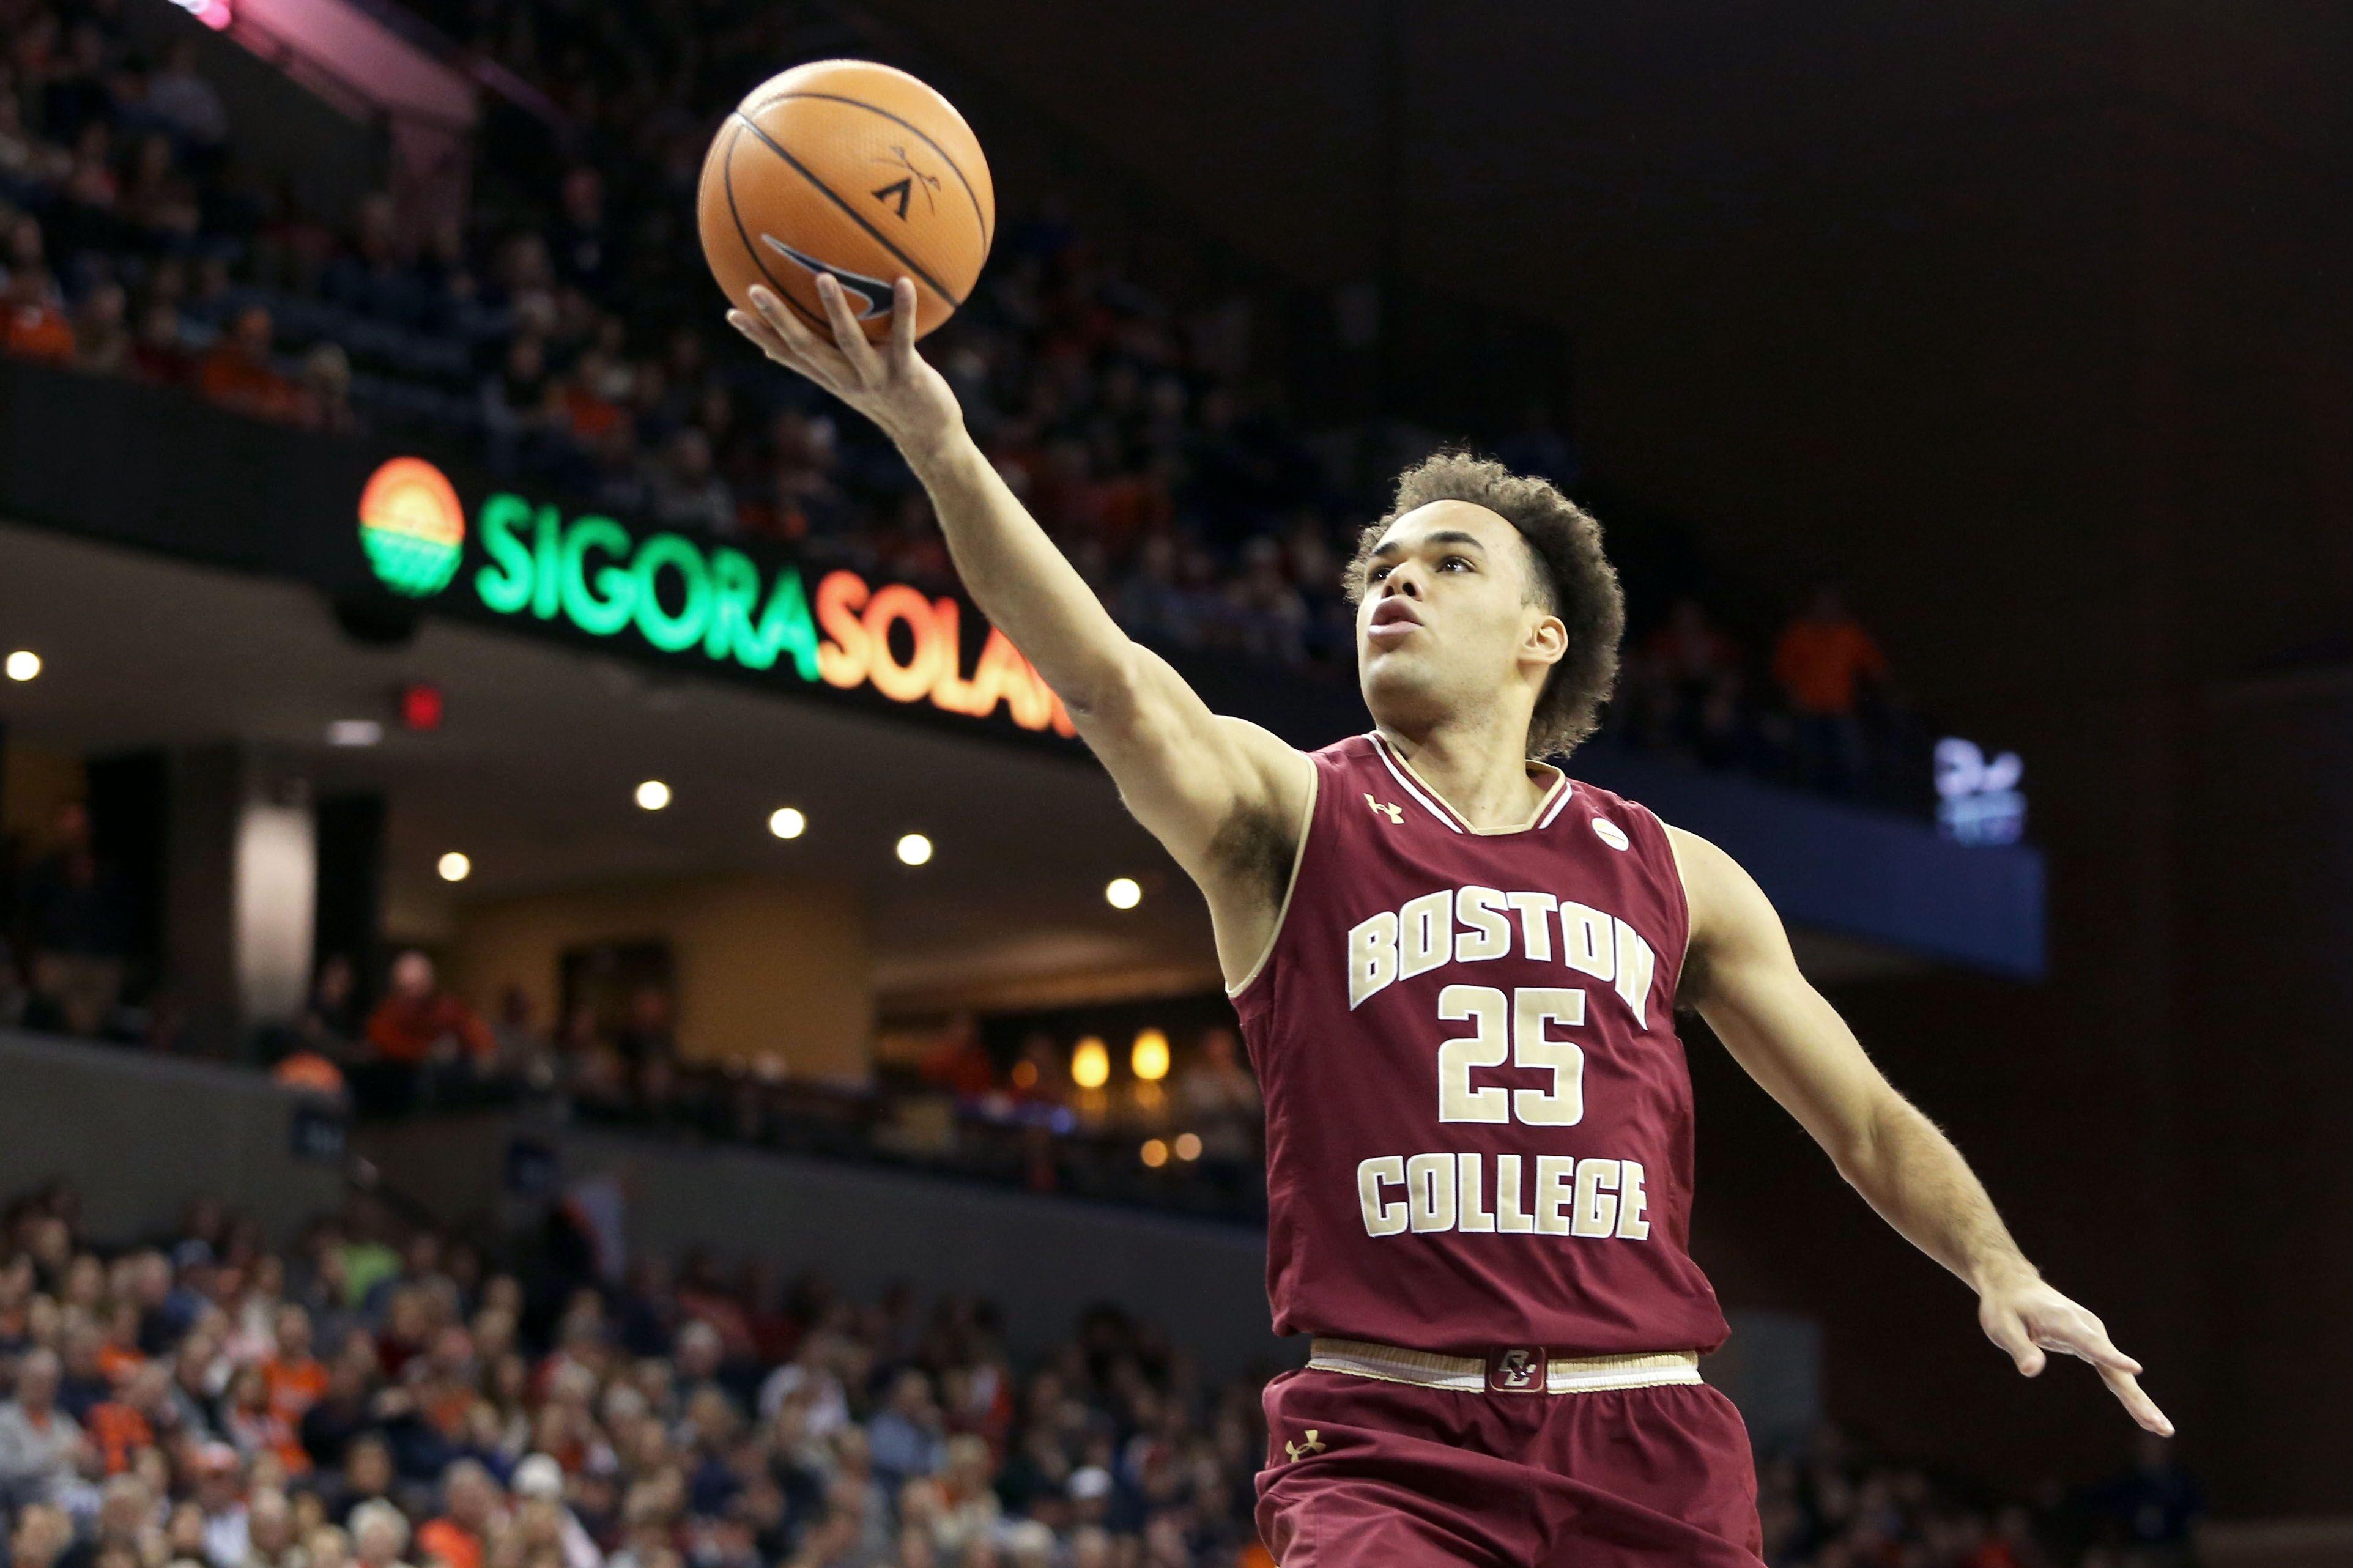 Boston College Vs Syracuse College Basketball Game Preview Tv